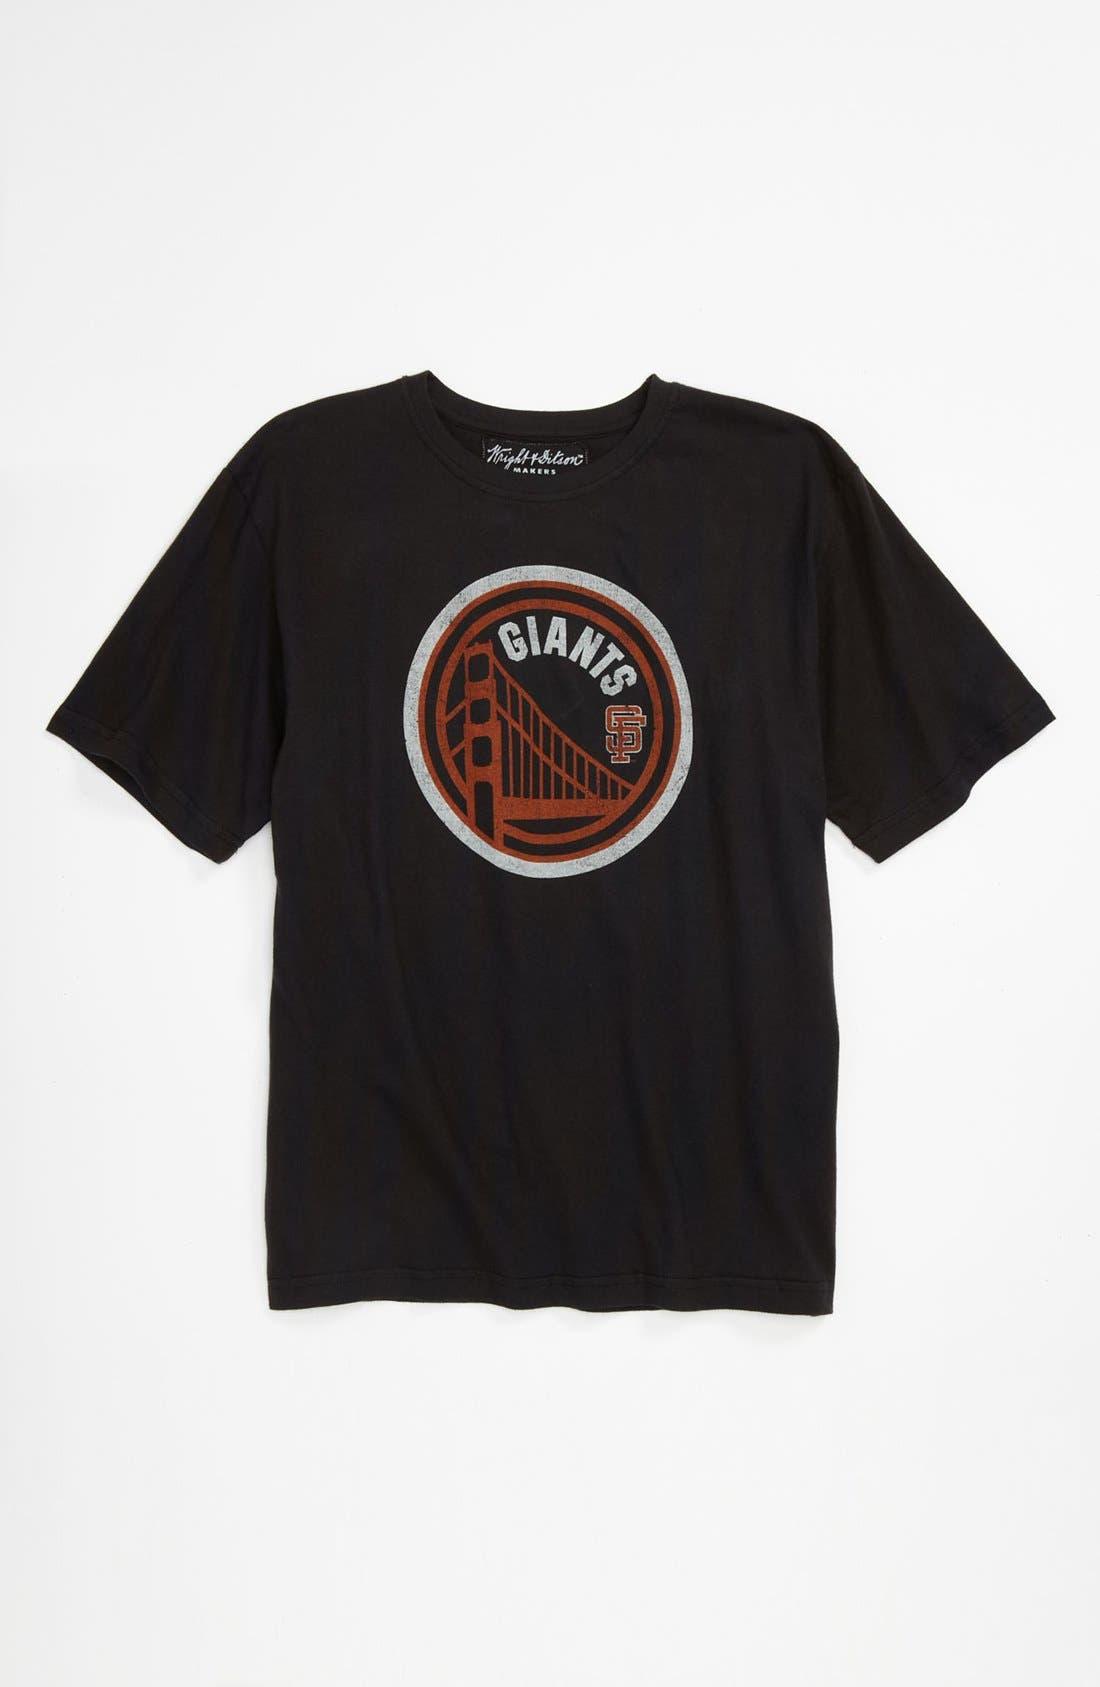 WRIGHT & DITSON San Francisco Giants T-Shirt